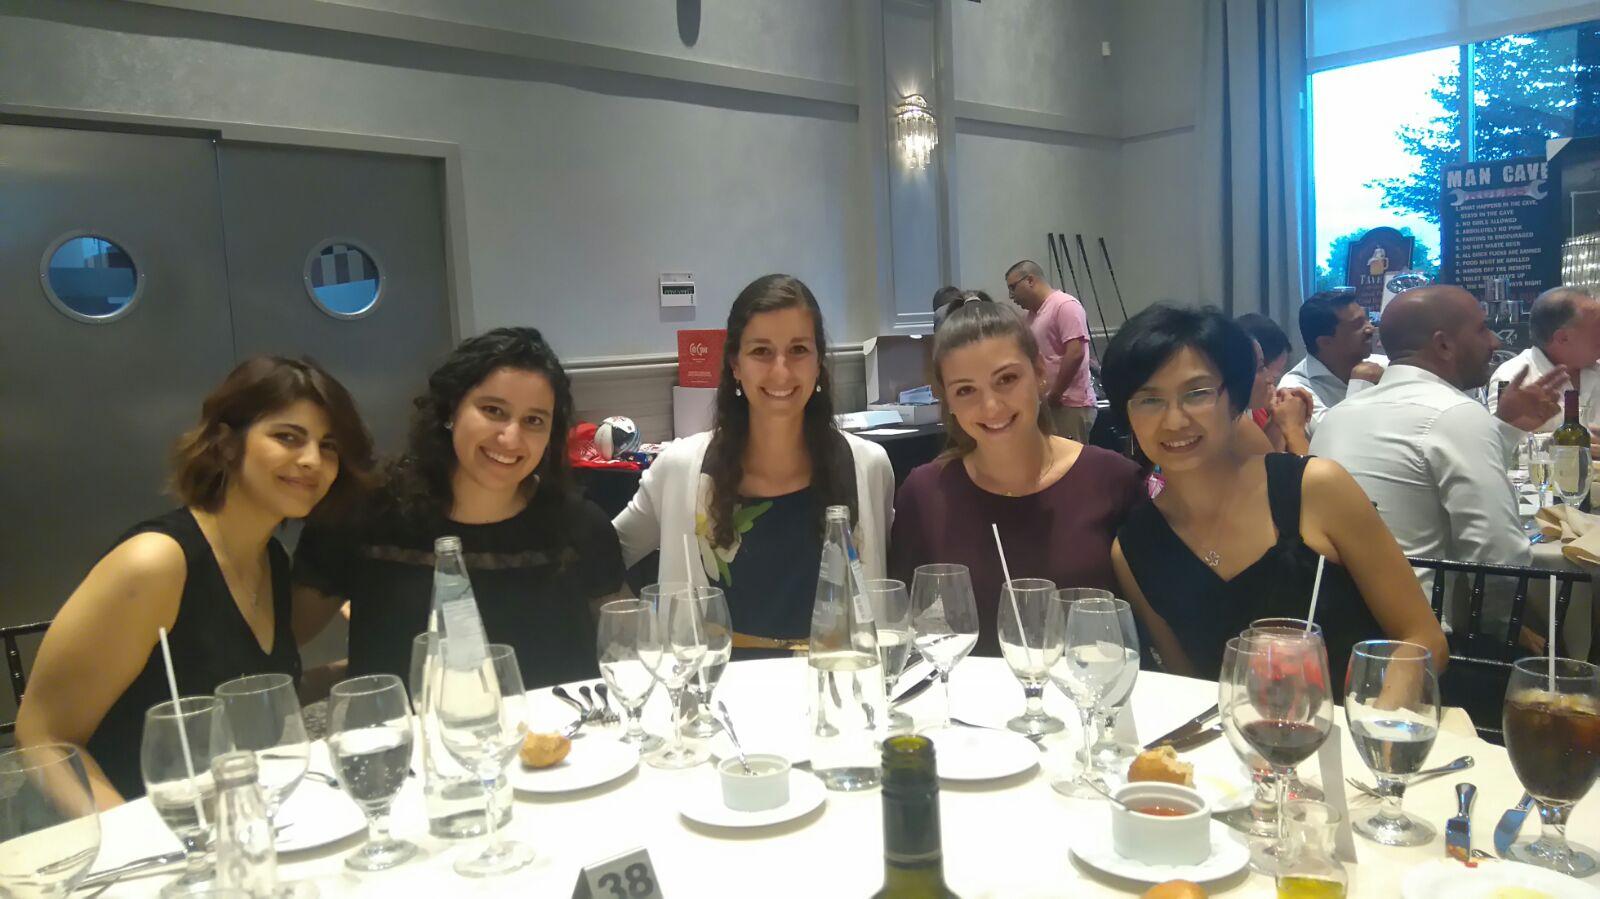 Photo of Niloofar Ganji, Forouhideh Peyvandi, Alison Hock, Tali Filler and Carol Lee at the Robert Naccarato Memorial Charity Golf Dinner (2016)